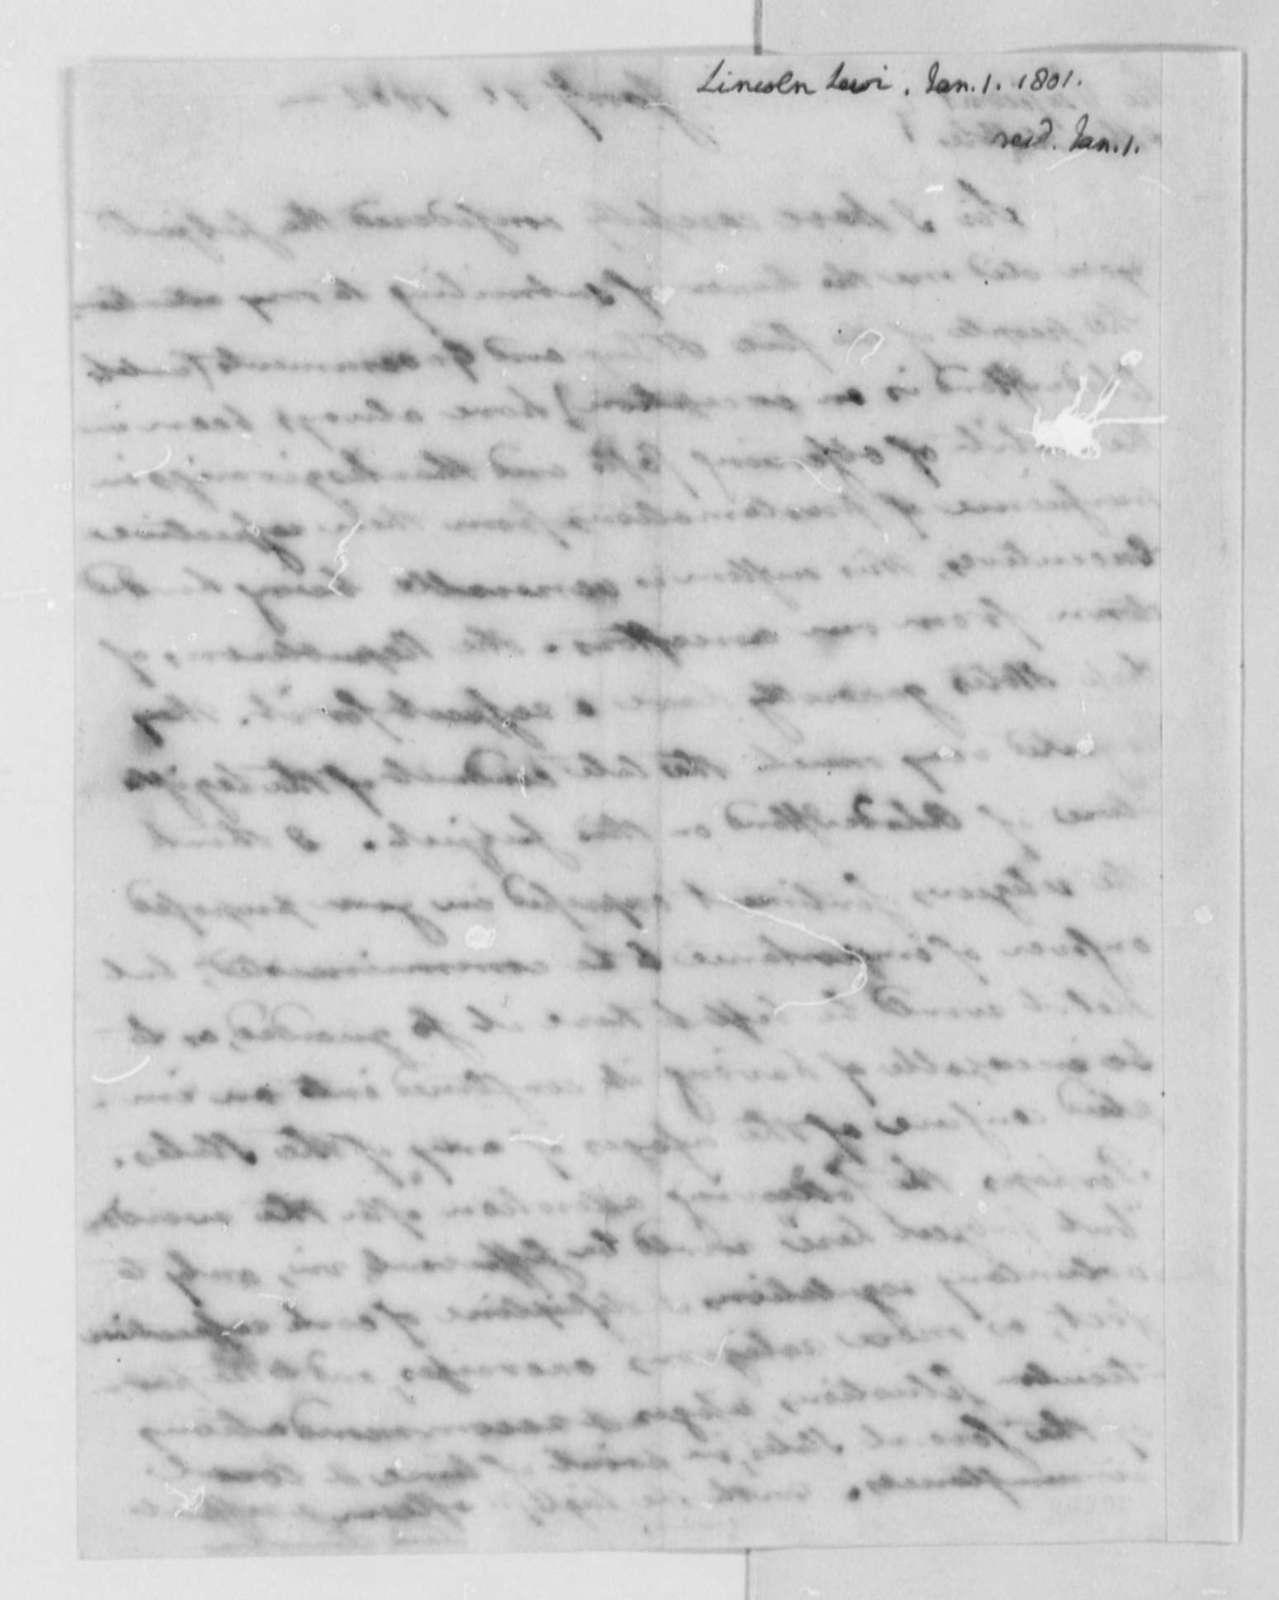 Levi Lincoln to Thomas Jefferson, January 1, 1802